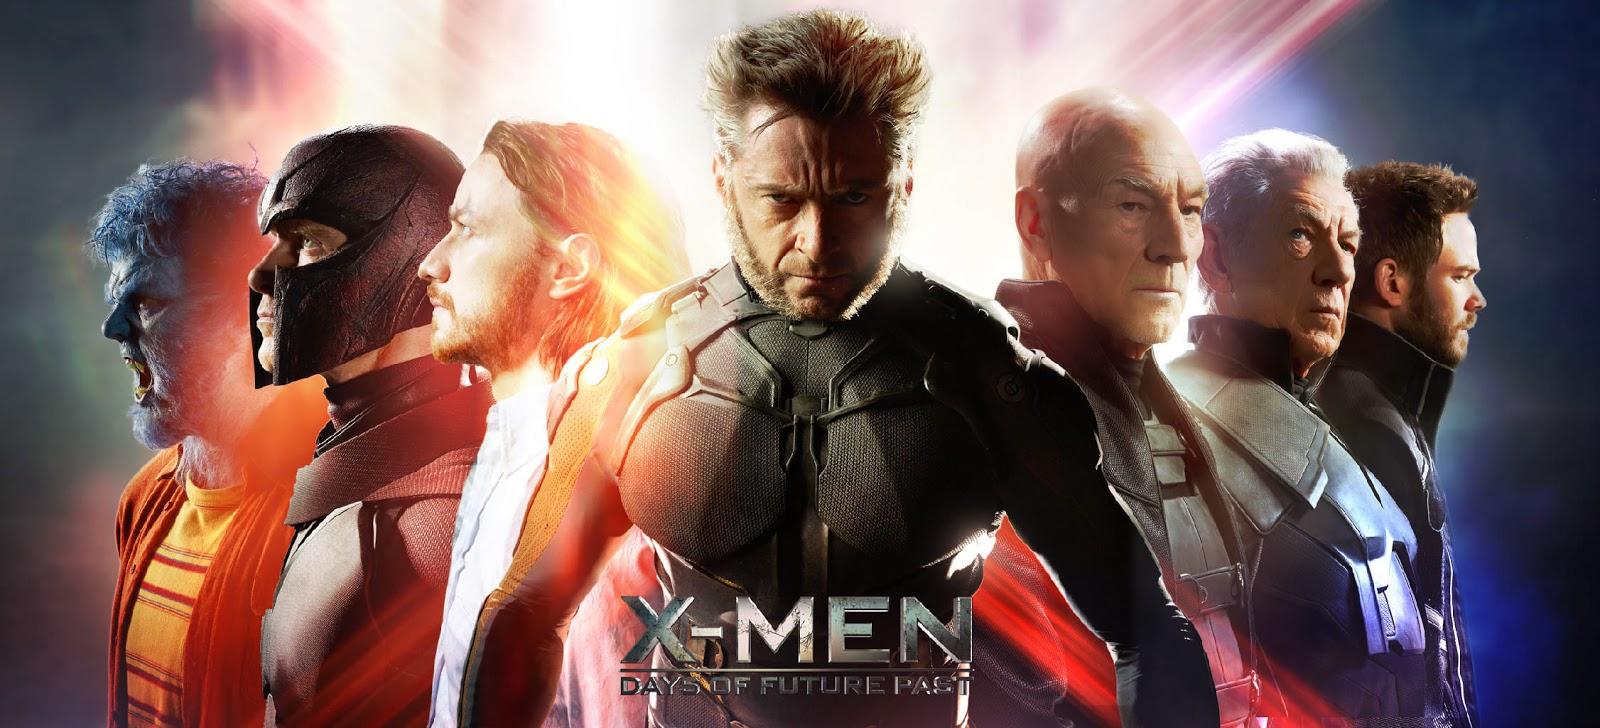 X-men-poster-cast